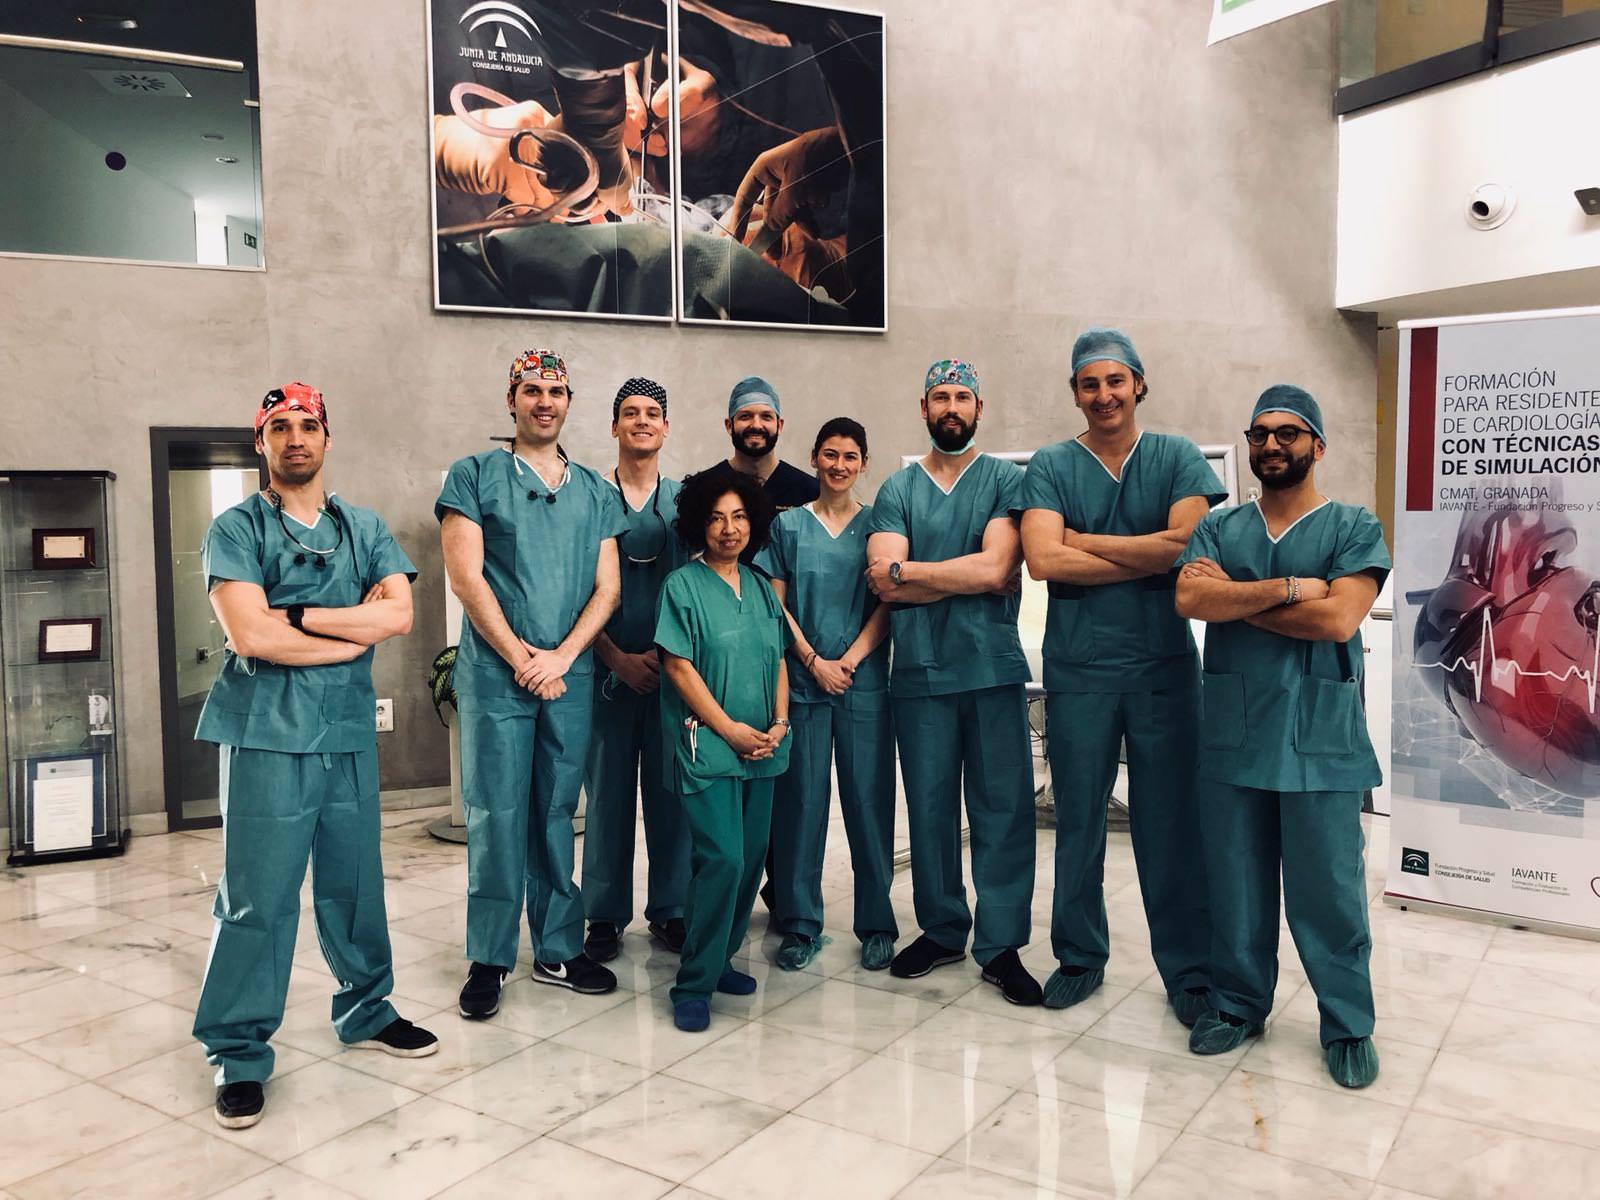 FACIALTEAM World Leaders in FFS Surgery